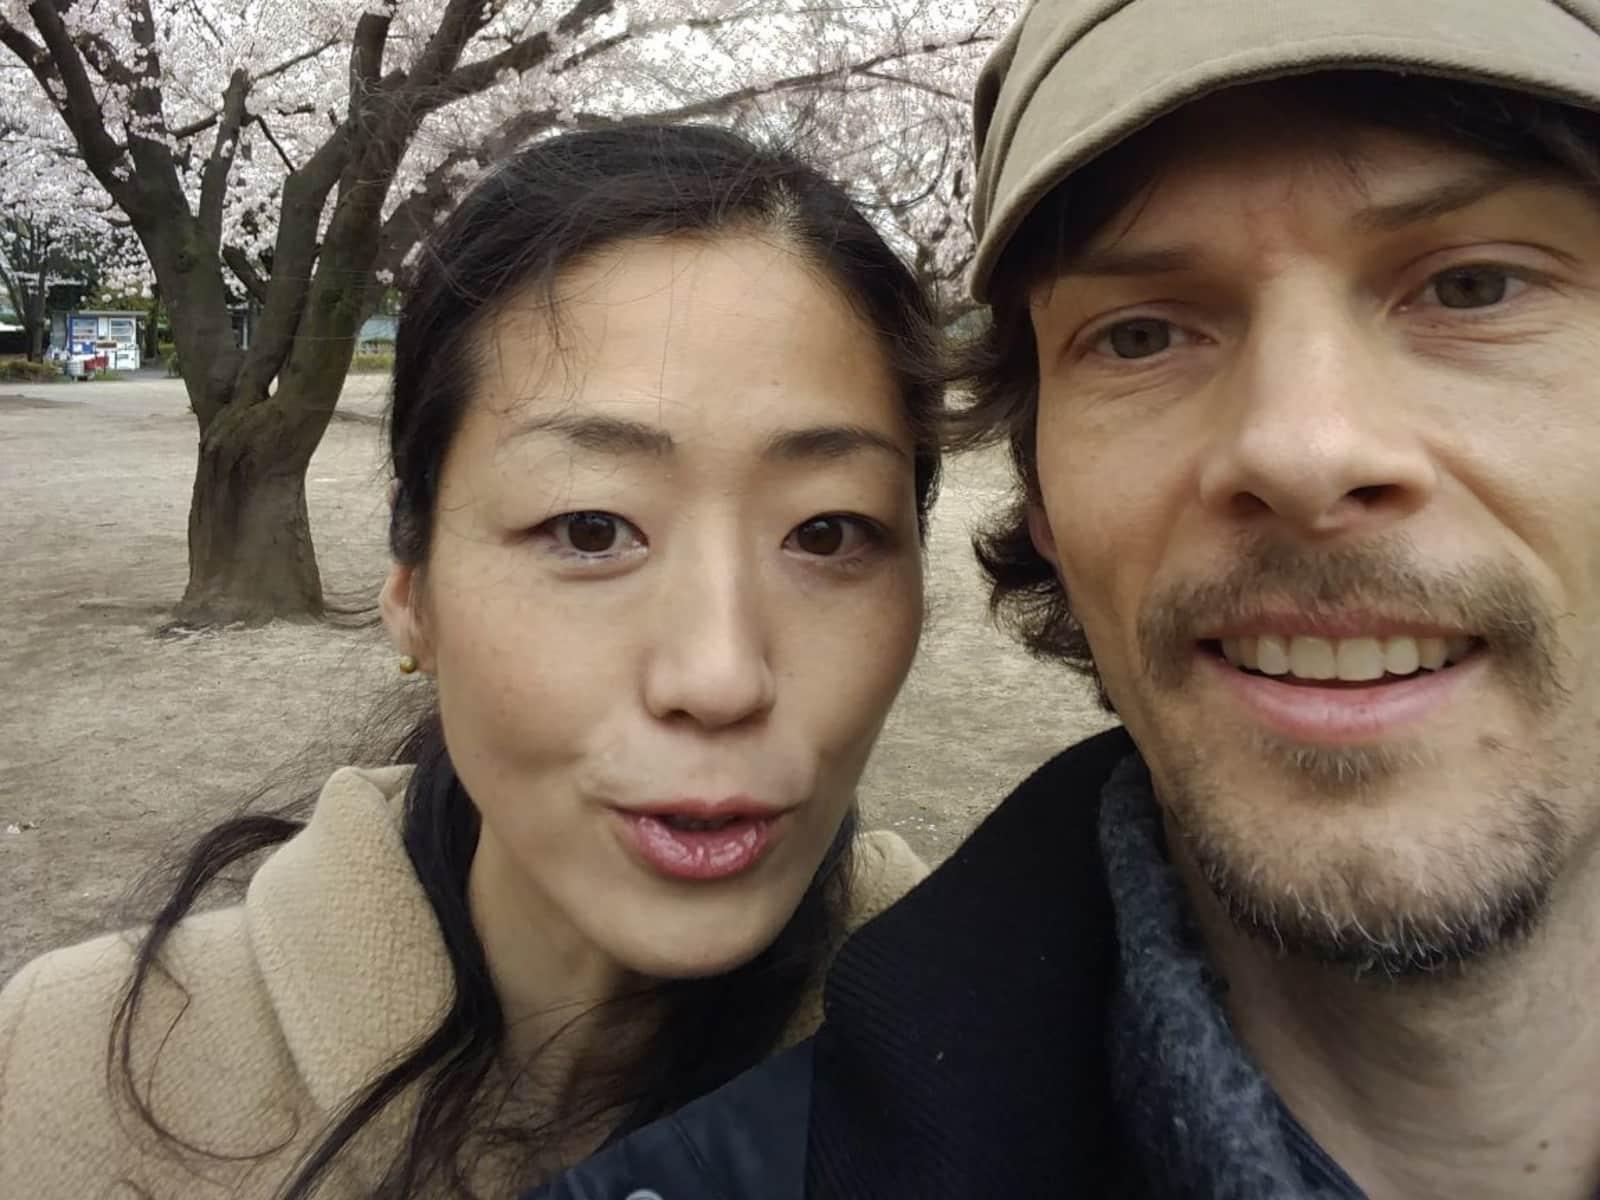 Adam & Utako from Fukagawa-Heikyūchō, Japan